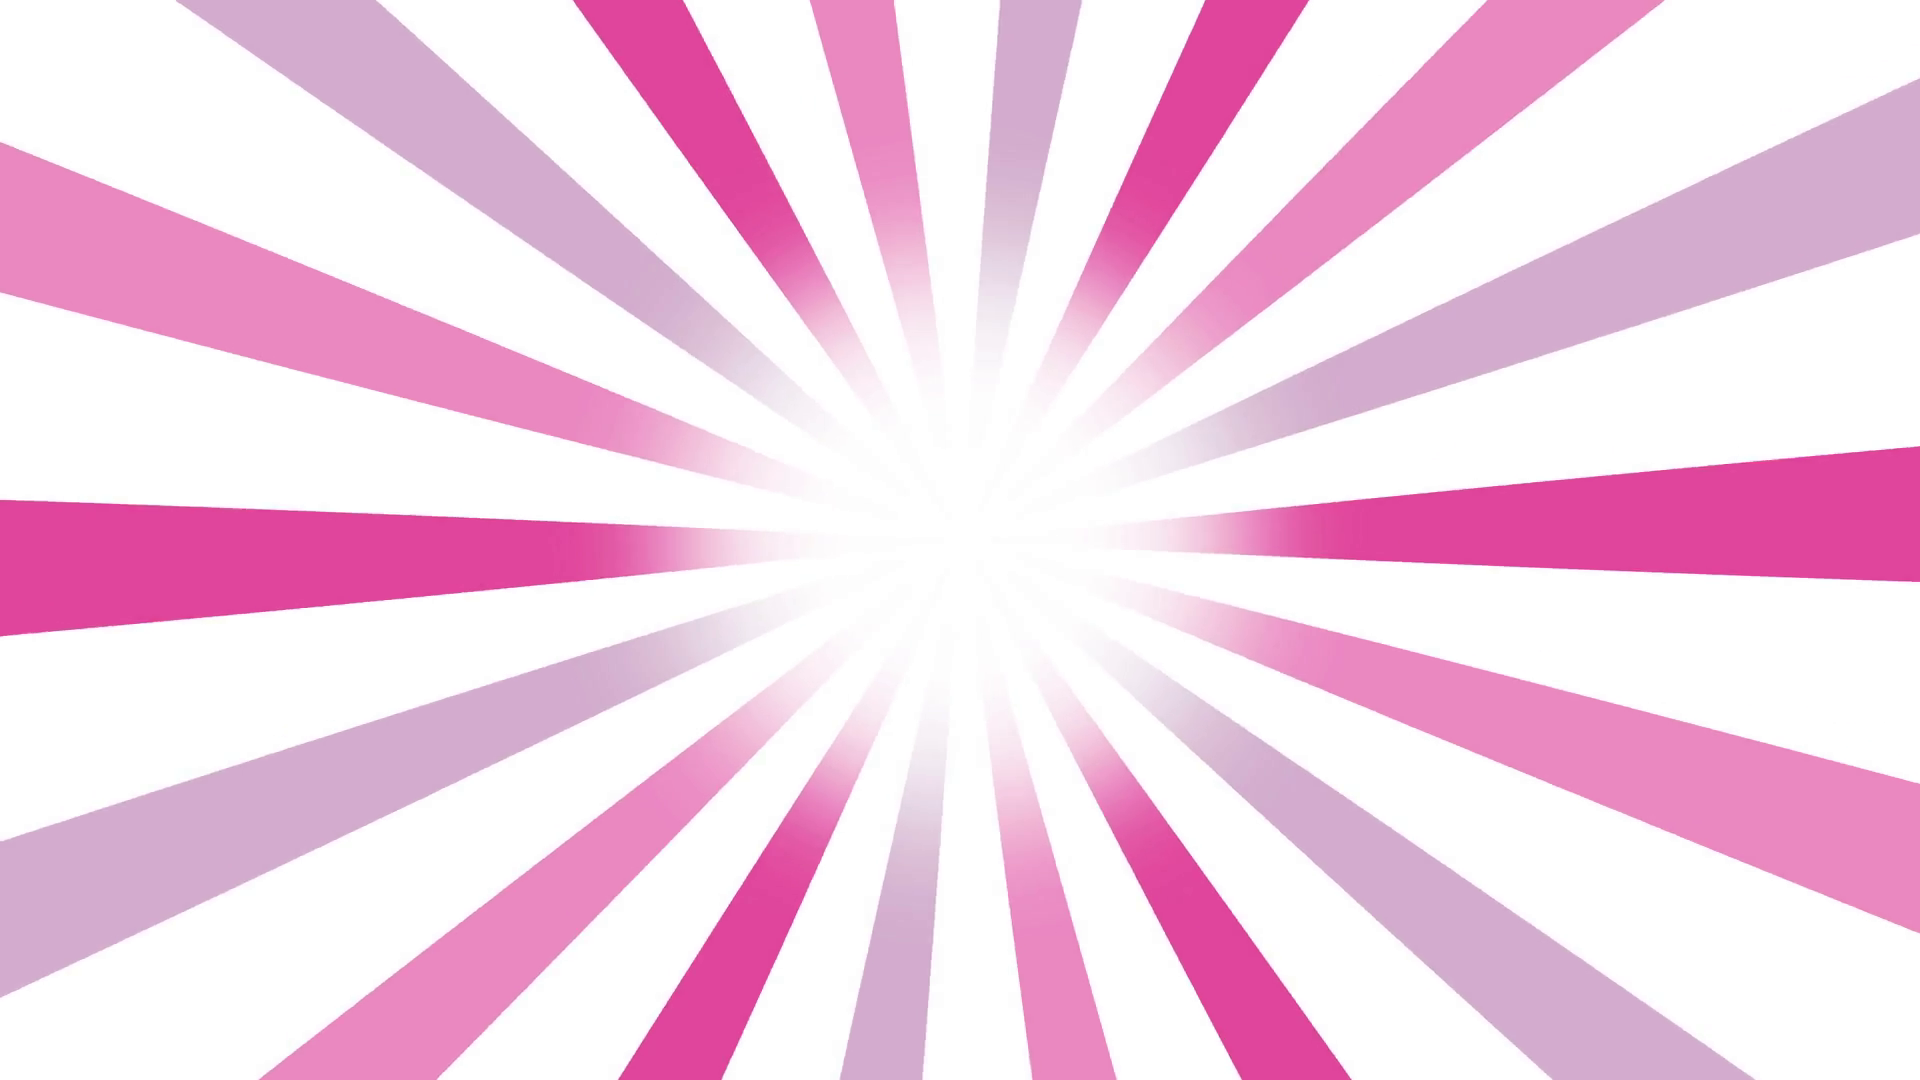 1920x1080 Multicolor Grunge Texture Pinky Burst Vector Background. Nice